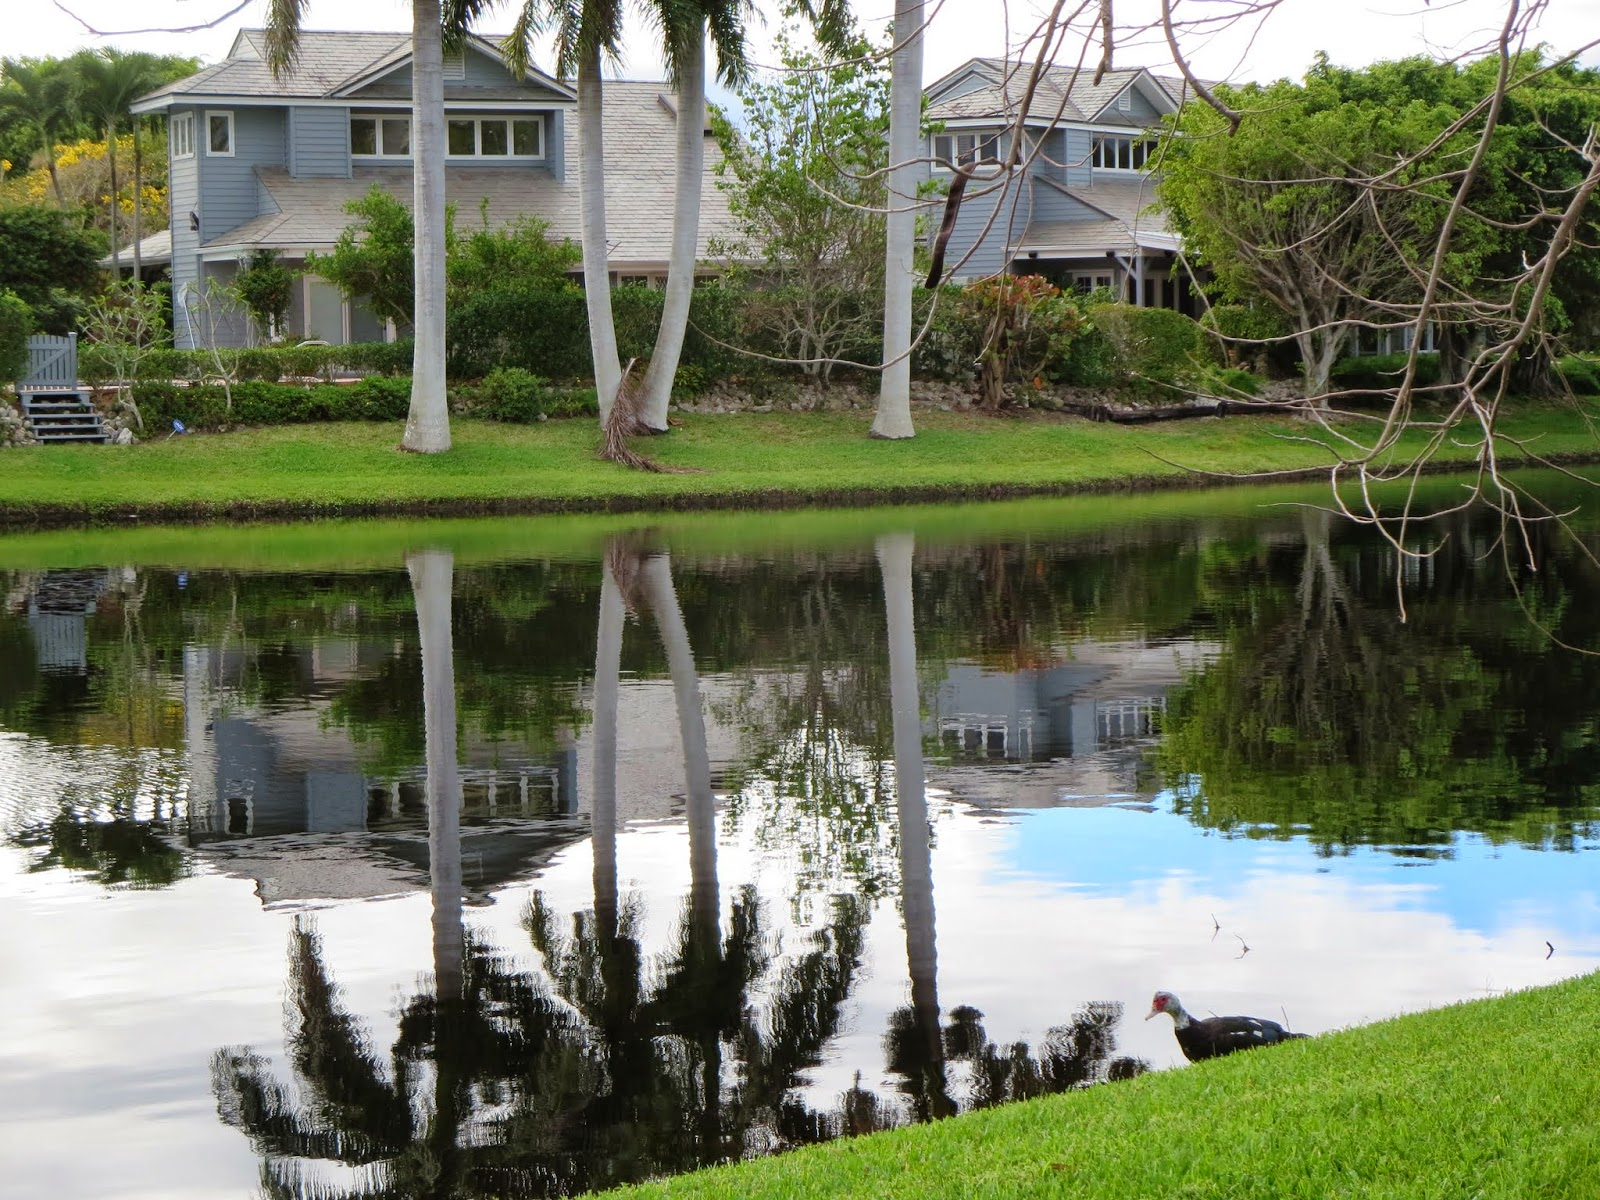 Naples, Florida - Clam Pass Boardwalk and Beach | Sidewalk Safari